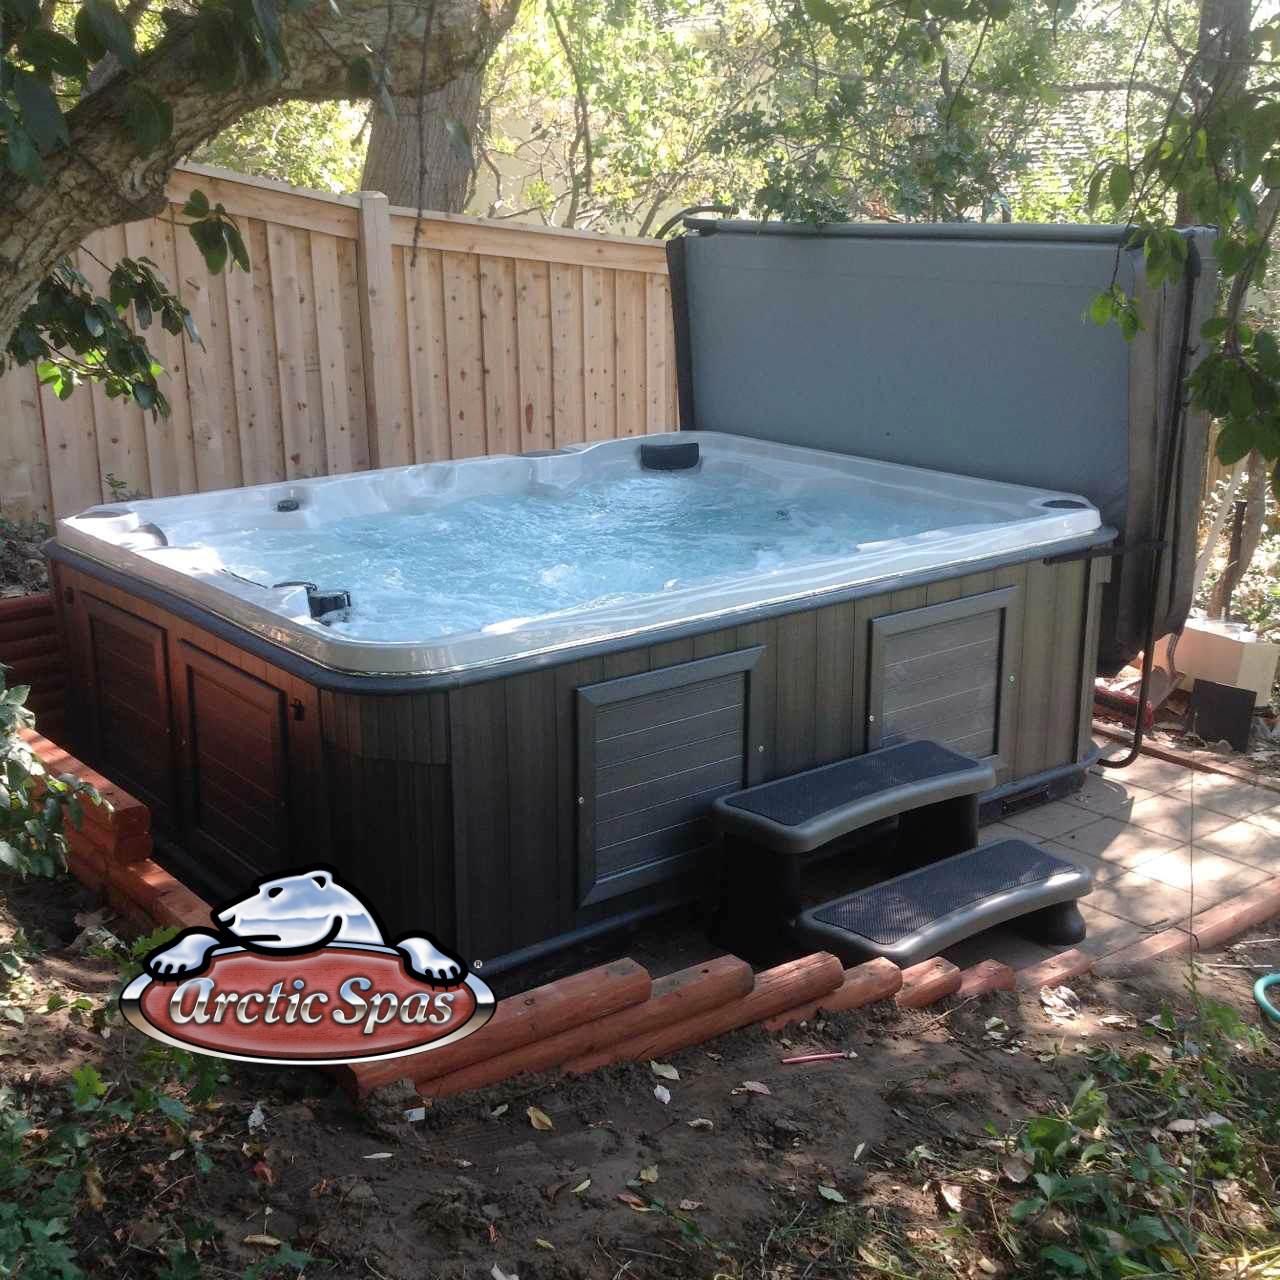 Knoch Family's new Arctic Spa hot tub Summit XL